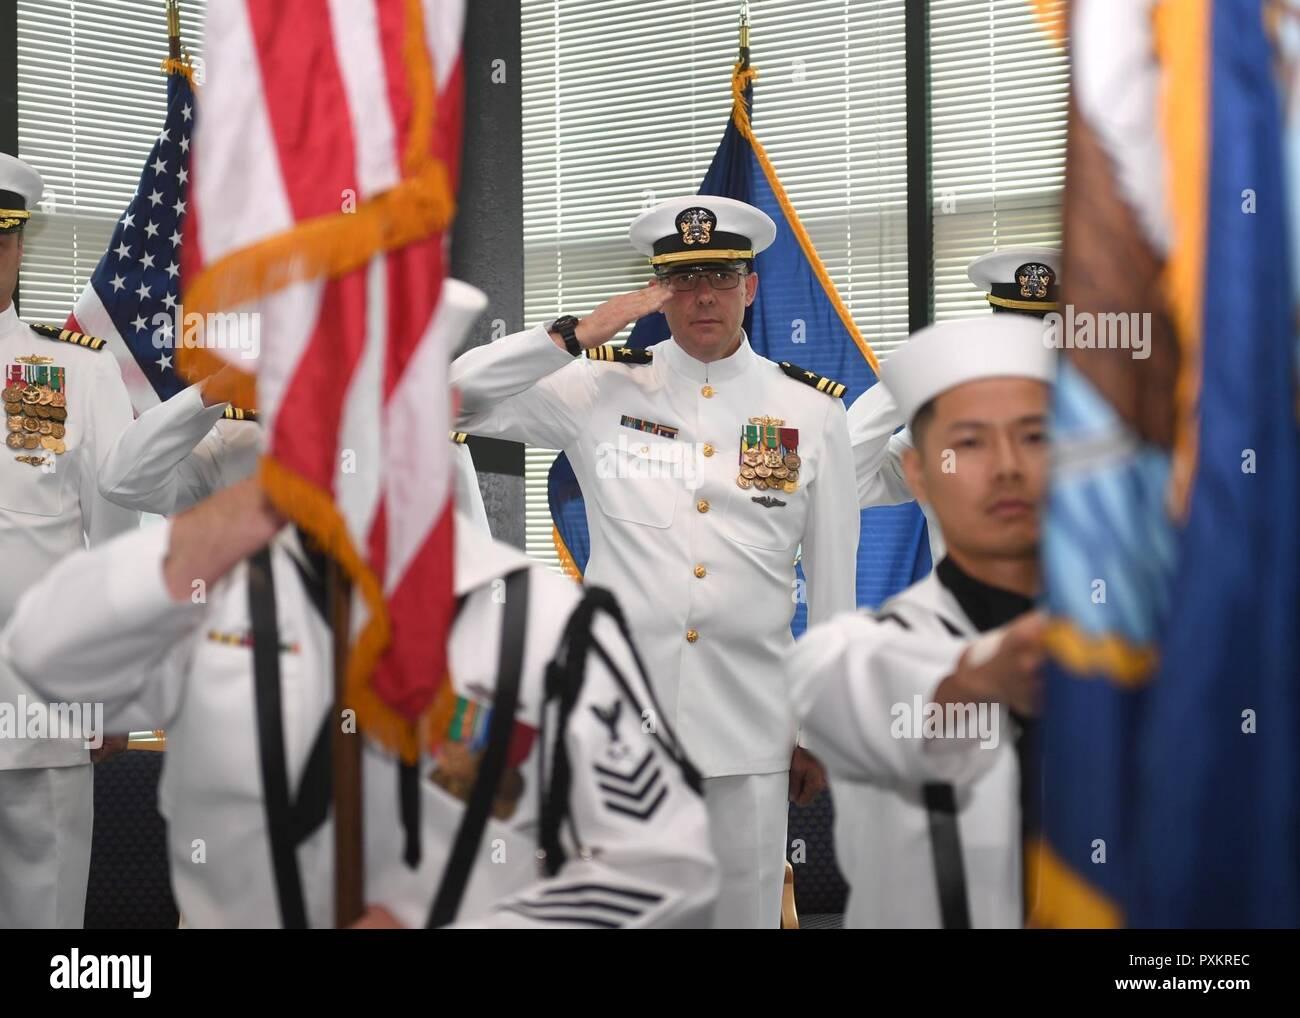 promo code 4365f 15315 EVERETT, Wash. (June 16, 2017) Lt. Cmdr. Marc C. Schuh, a ...